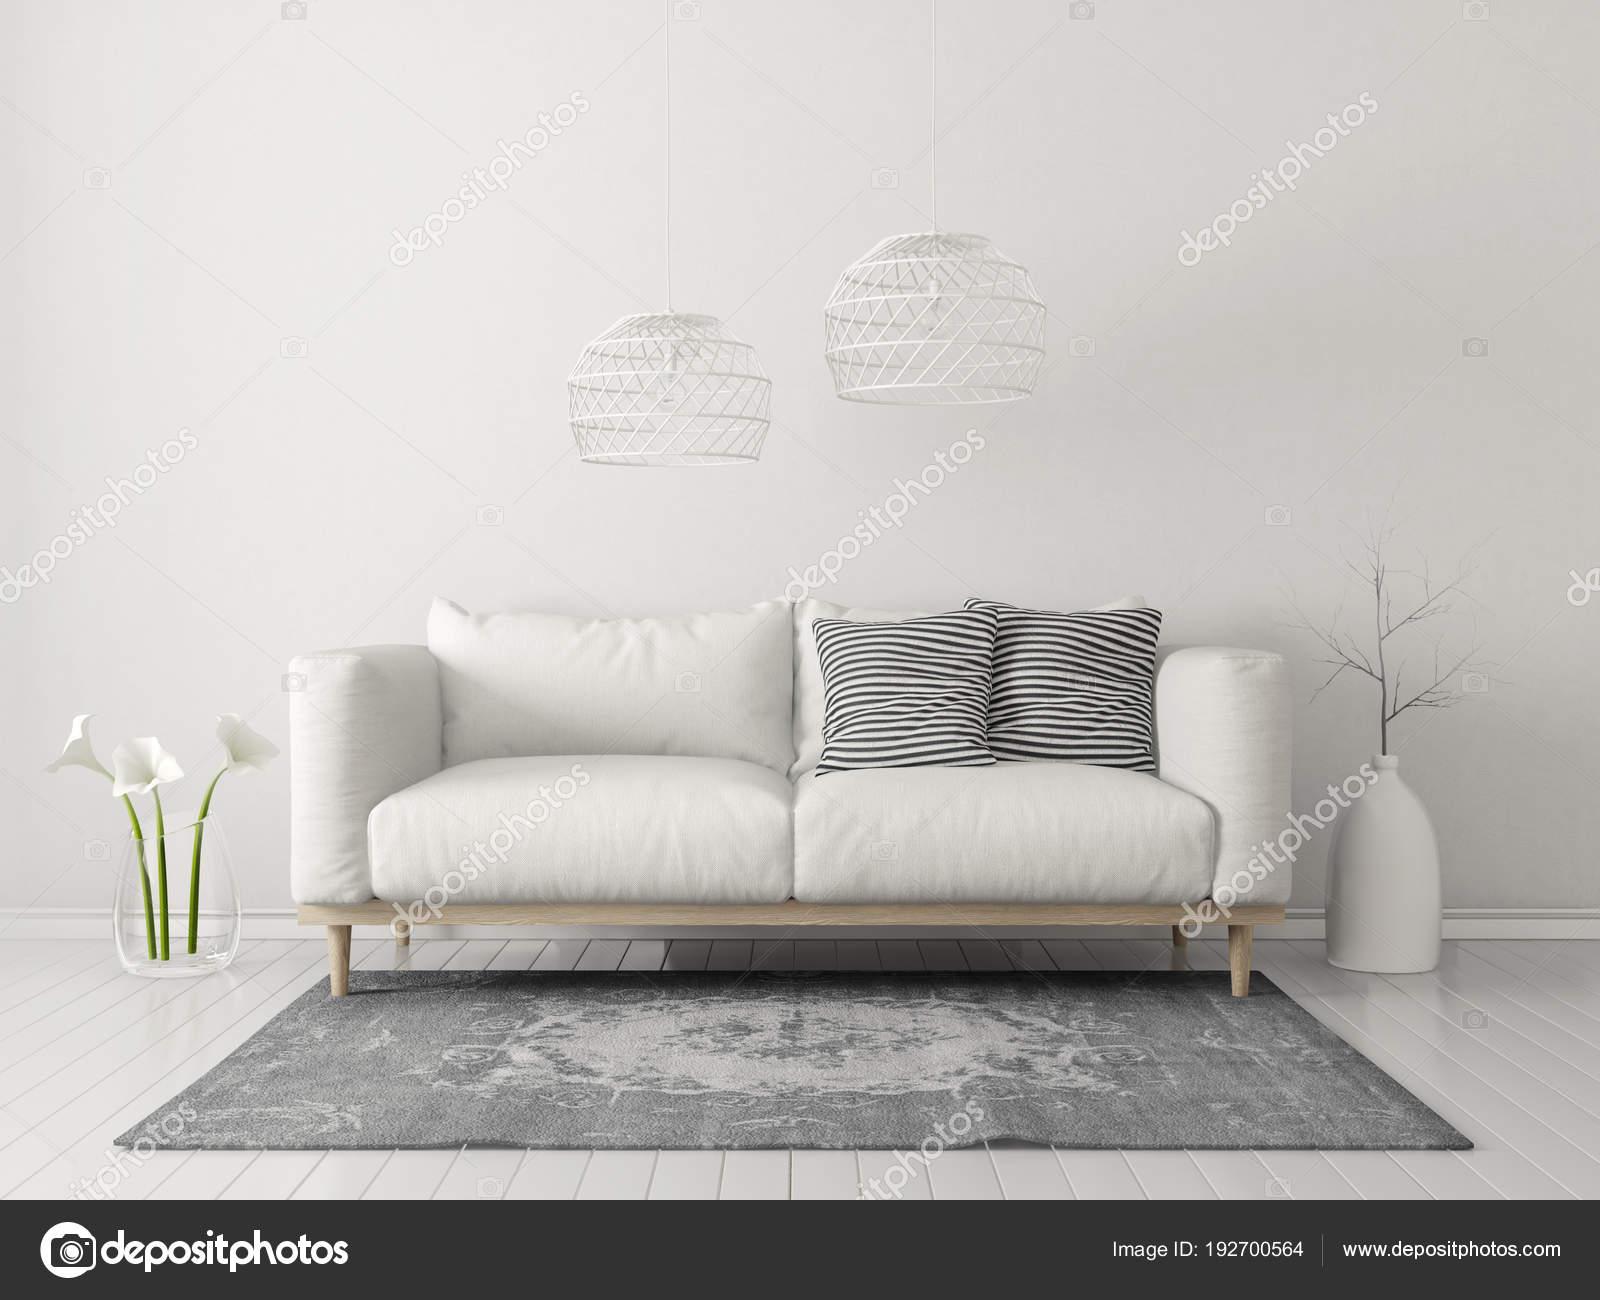 Modern Living Room White Sofa Lamp Scandinavian Interior Design Furniture Stock Photo C Alexroz 192700564